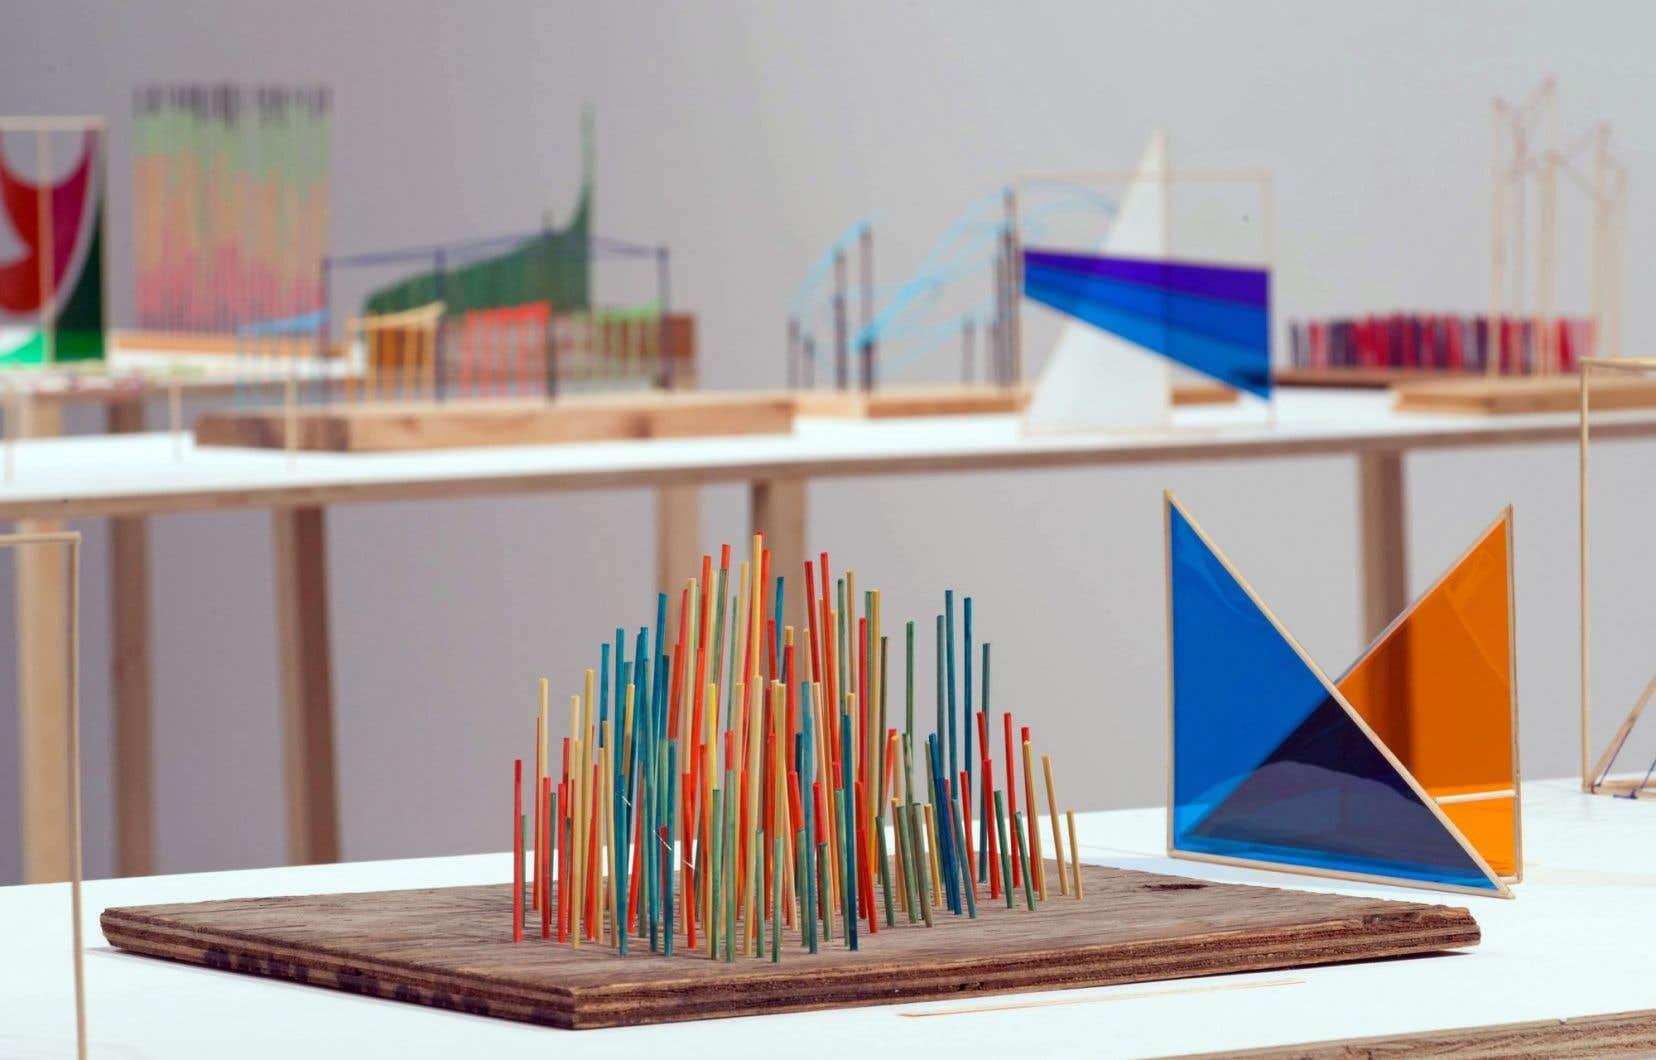 Détail de l'installation «Each Number Equals One Inhalation and One Exhalation» de Richard Ibghy et Marilou Lemmens